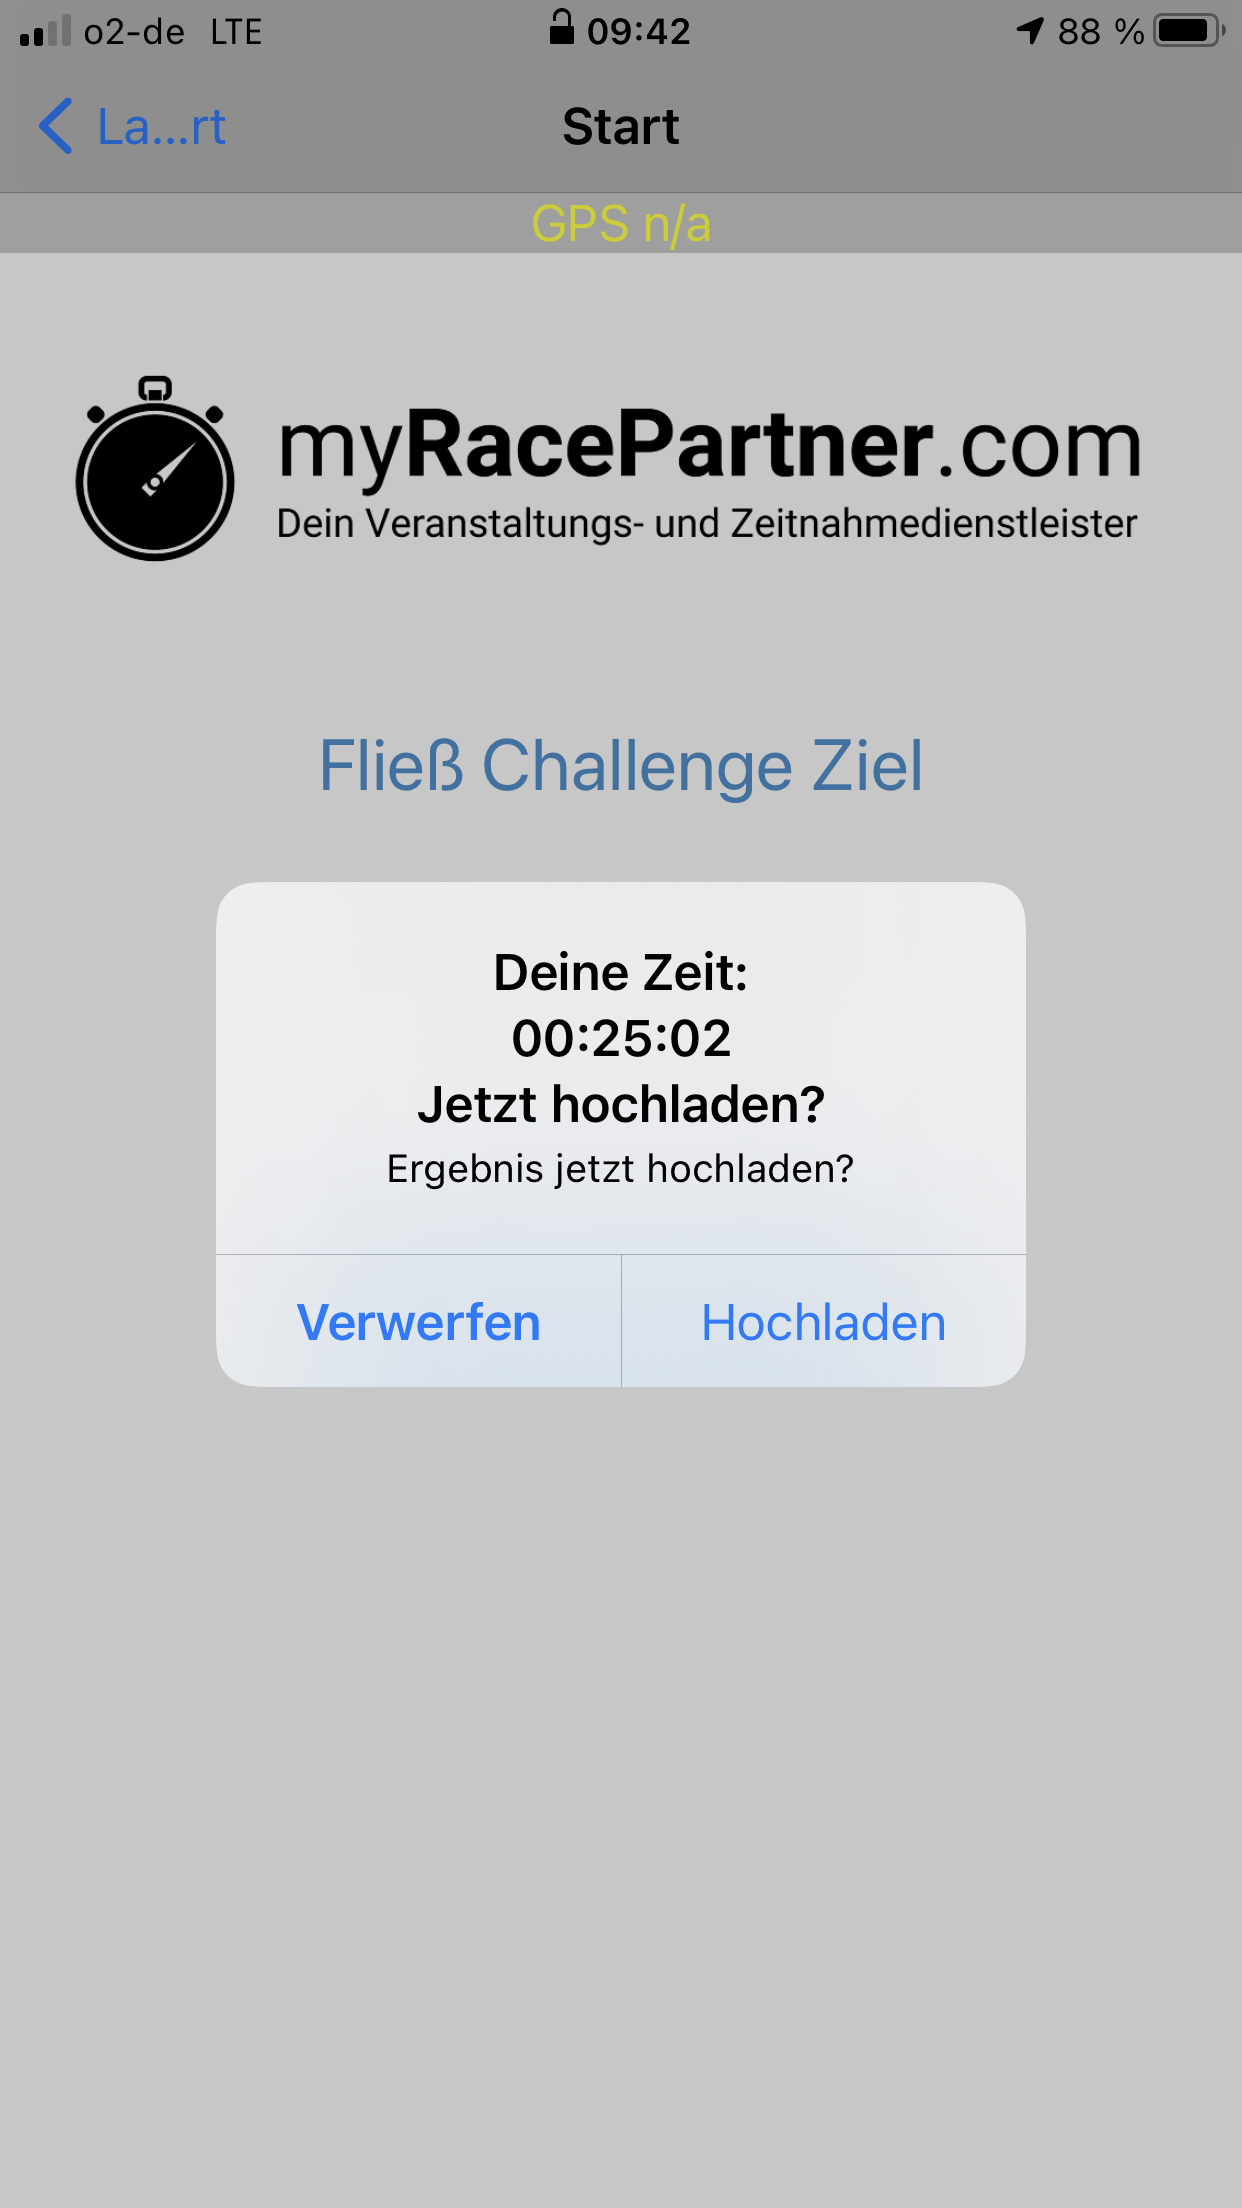 myRacePartner.com - Die App im Ziel 1